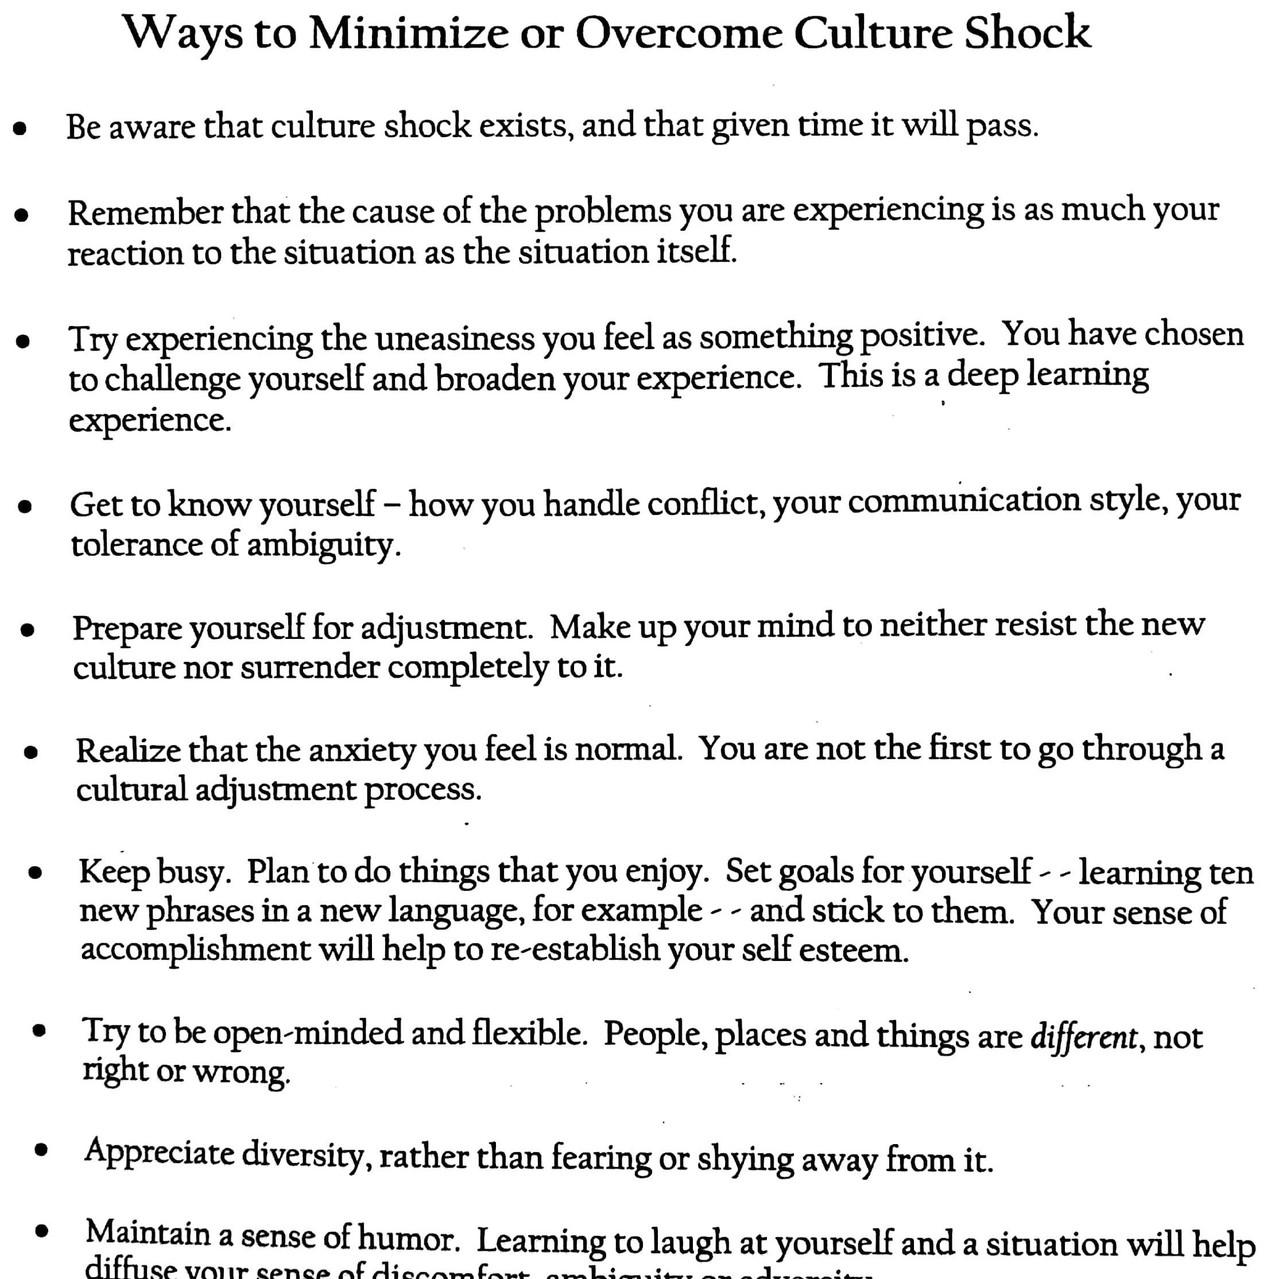 Ways to Minimize Culture Shock